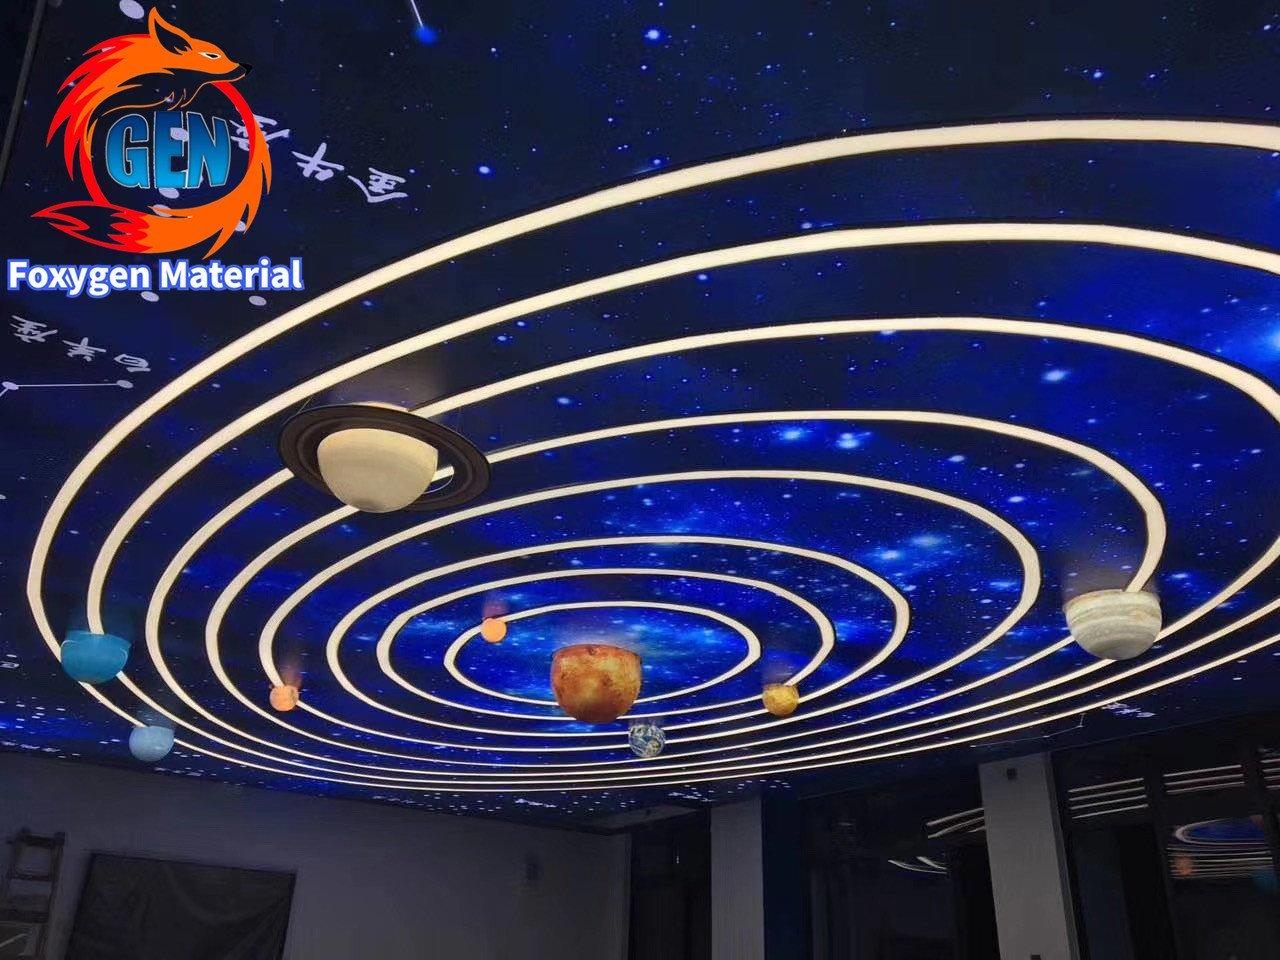 Foxygen customized print uv Stretch ceiling film the solar system .